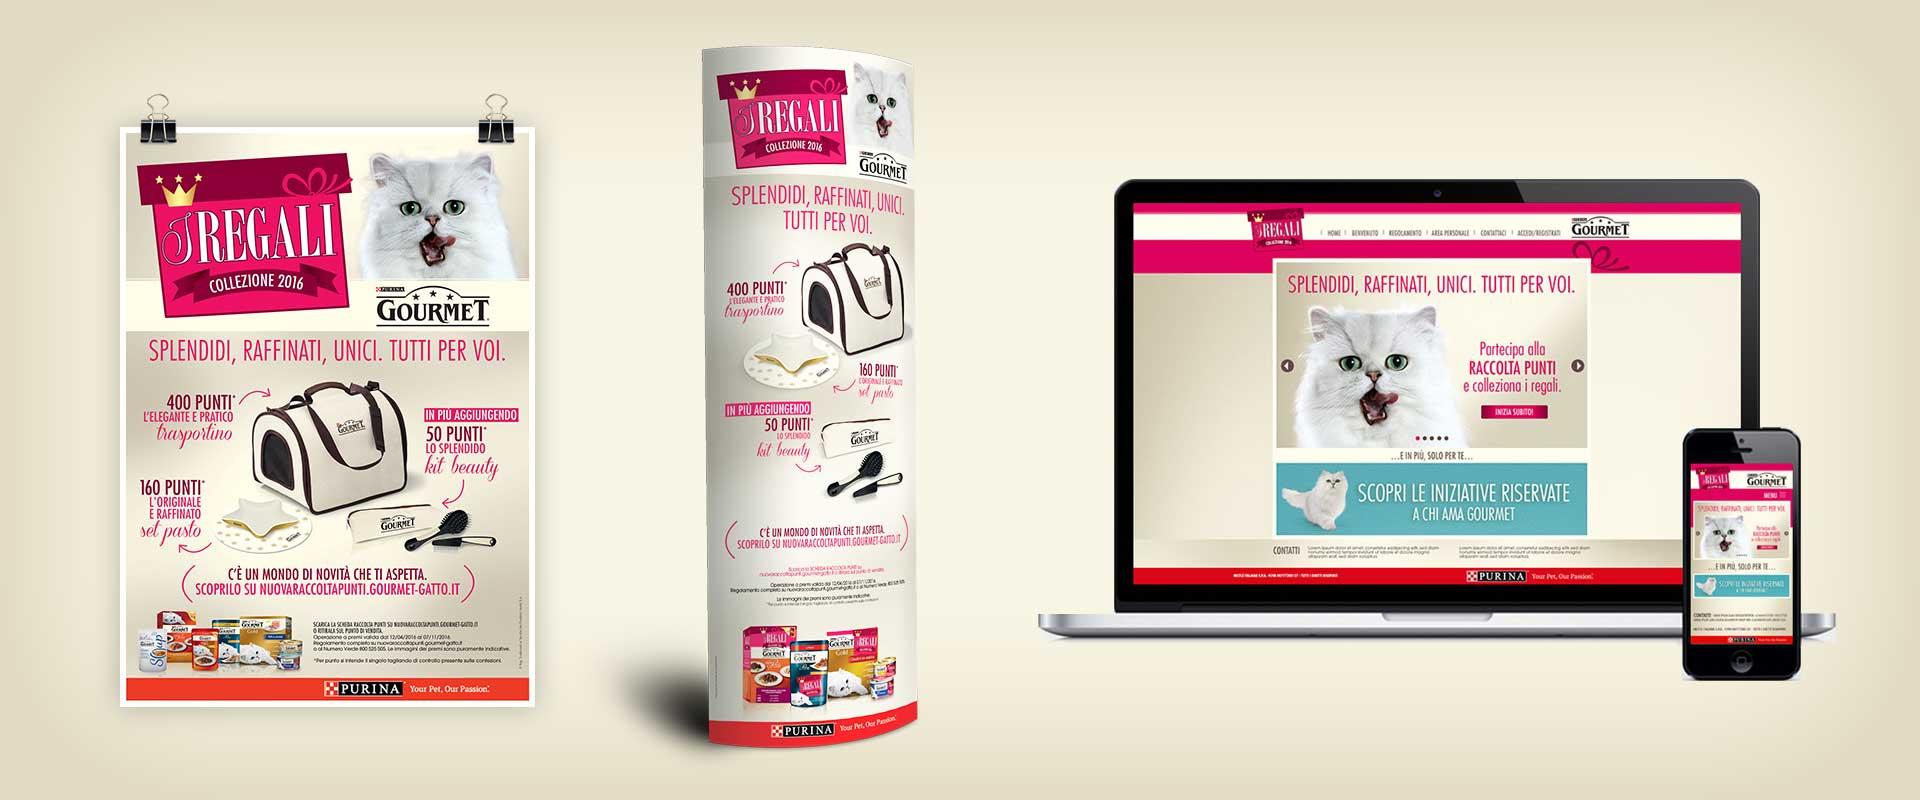 materiali punto vendita digital web design concept collection raccolta punti Gourmet